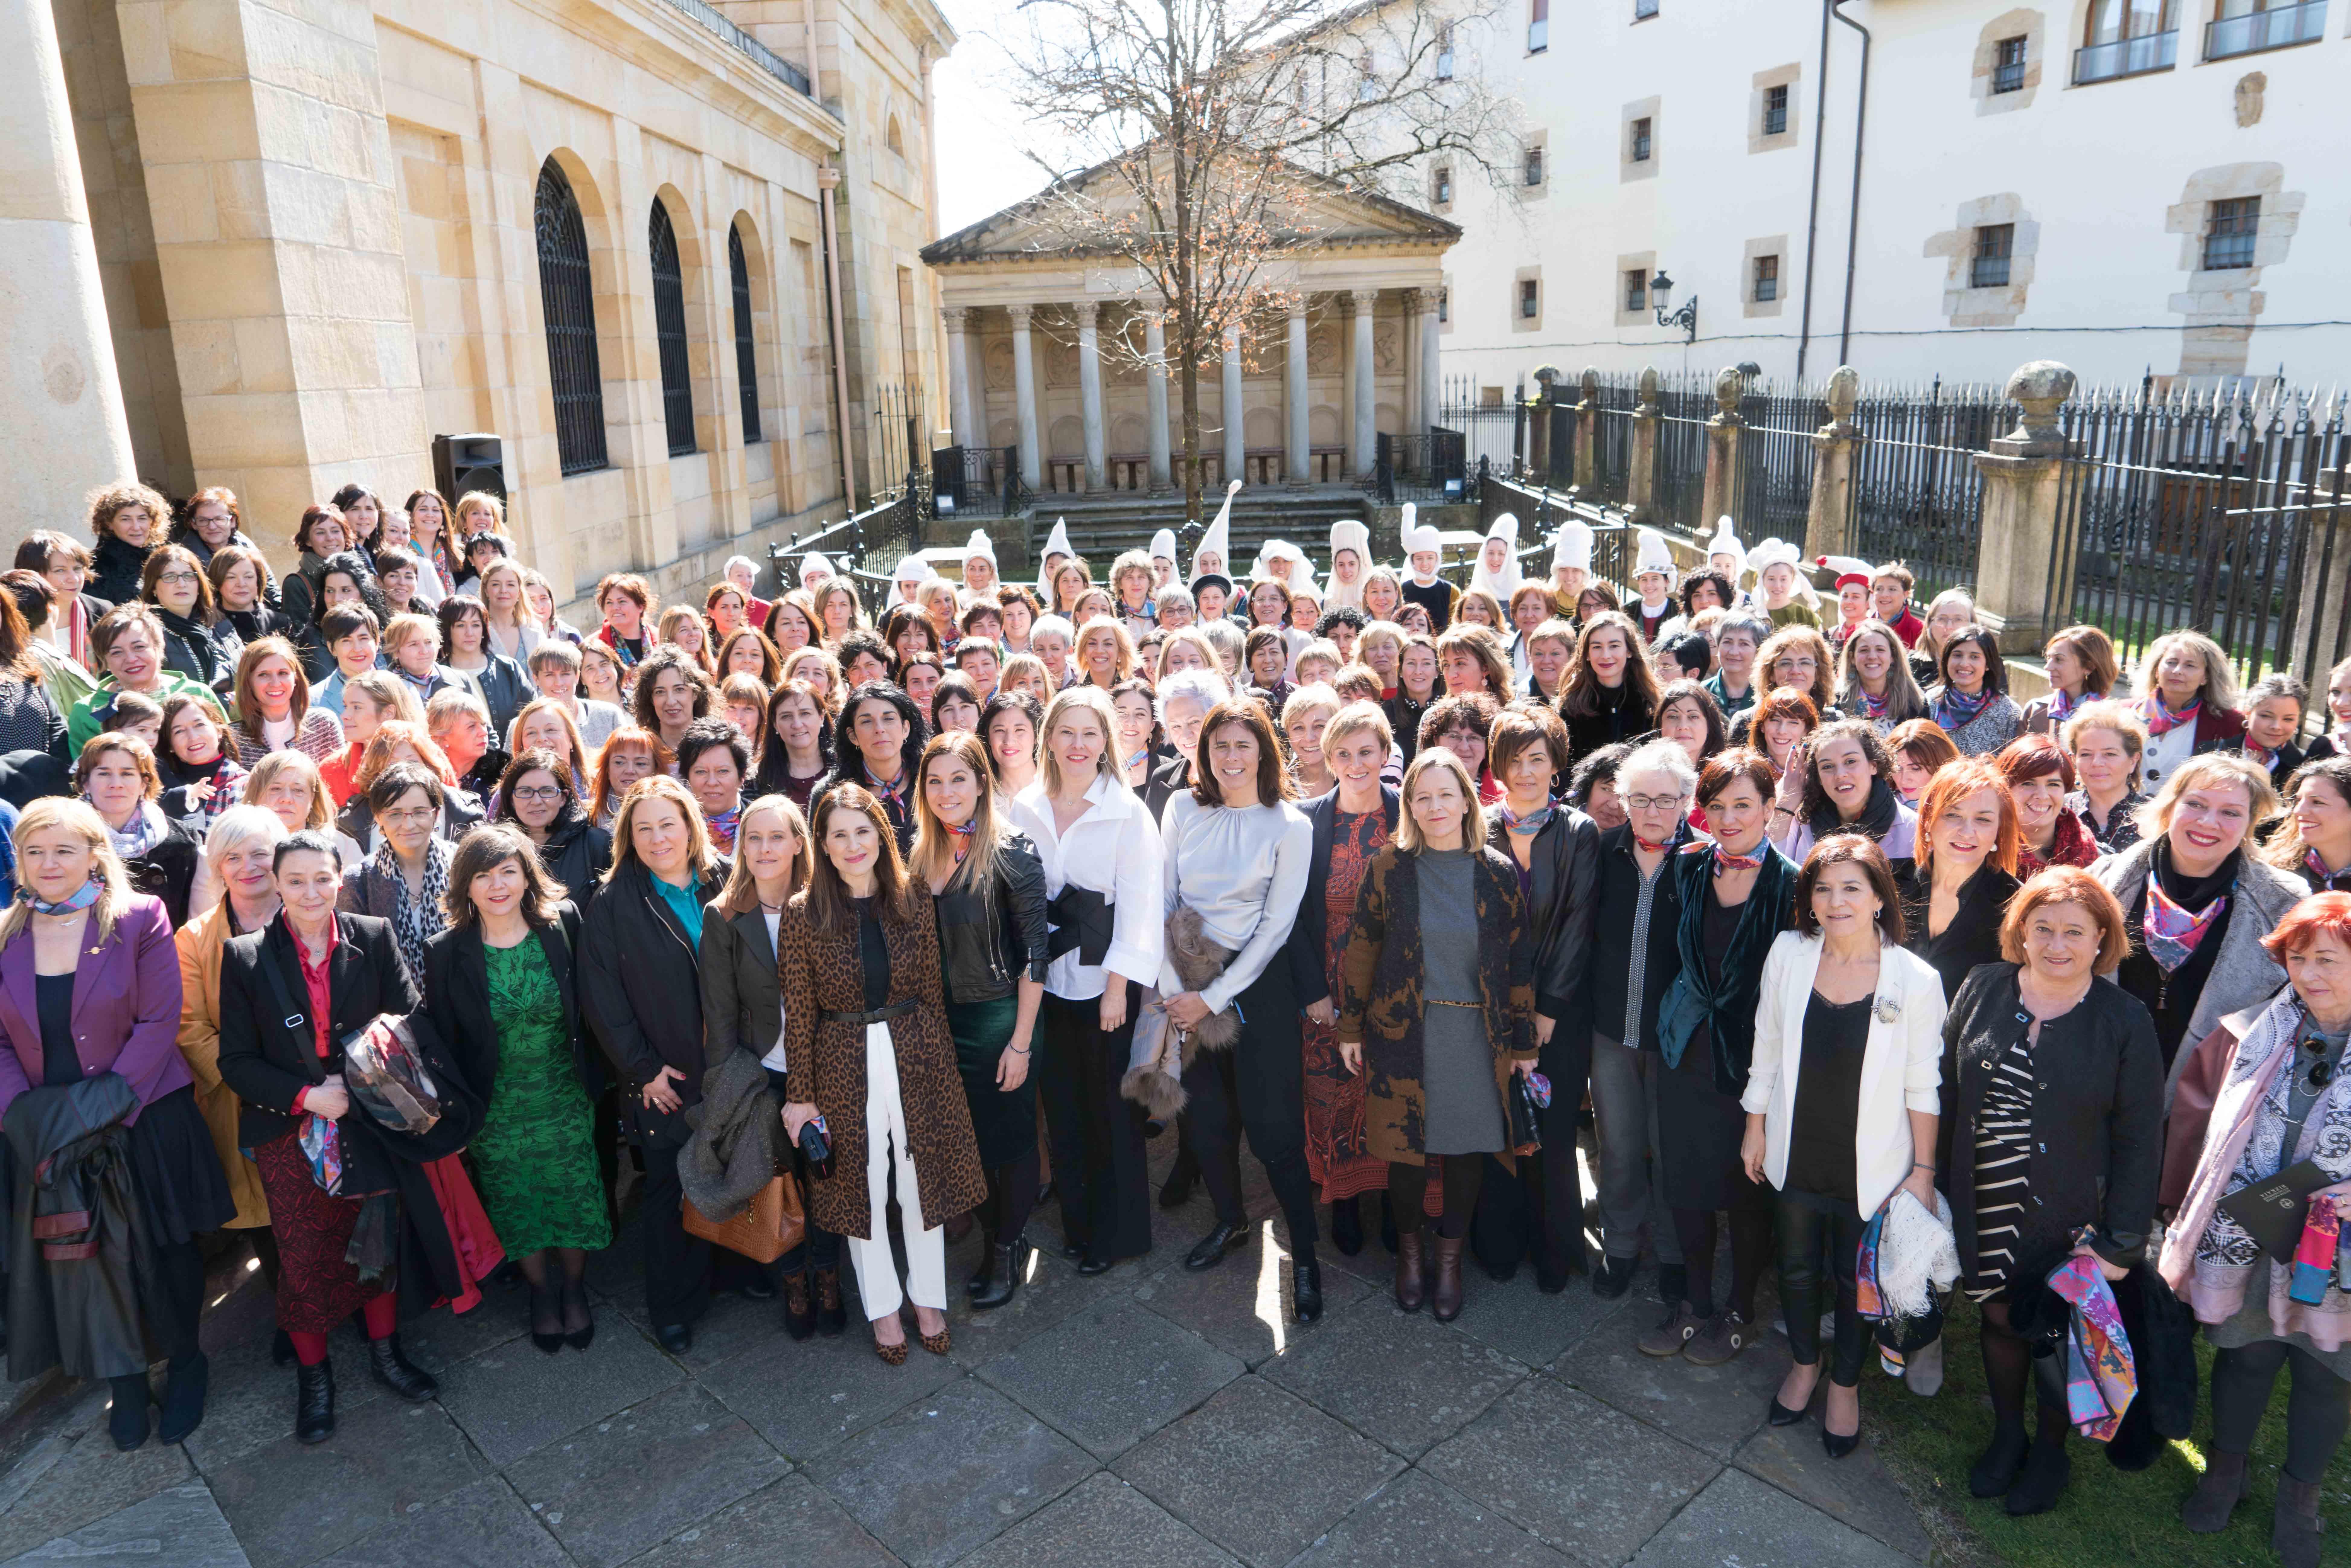 II Asamblea de Mujeres Electas Vascas